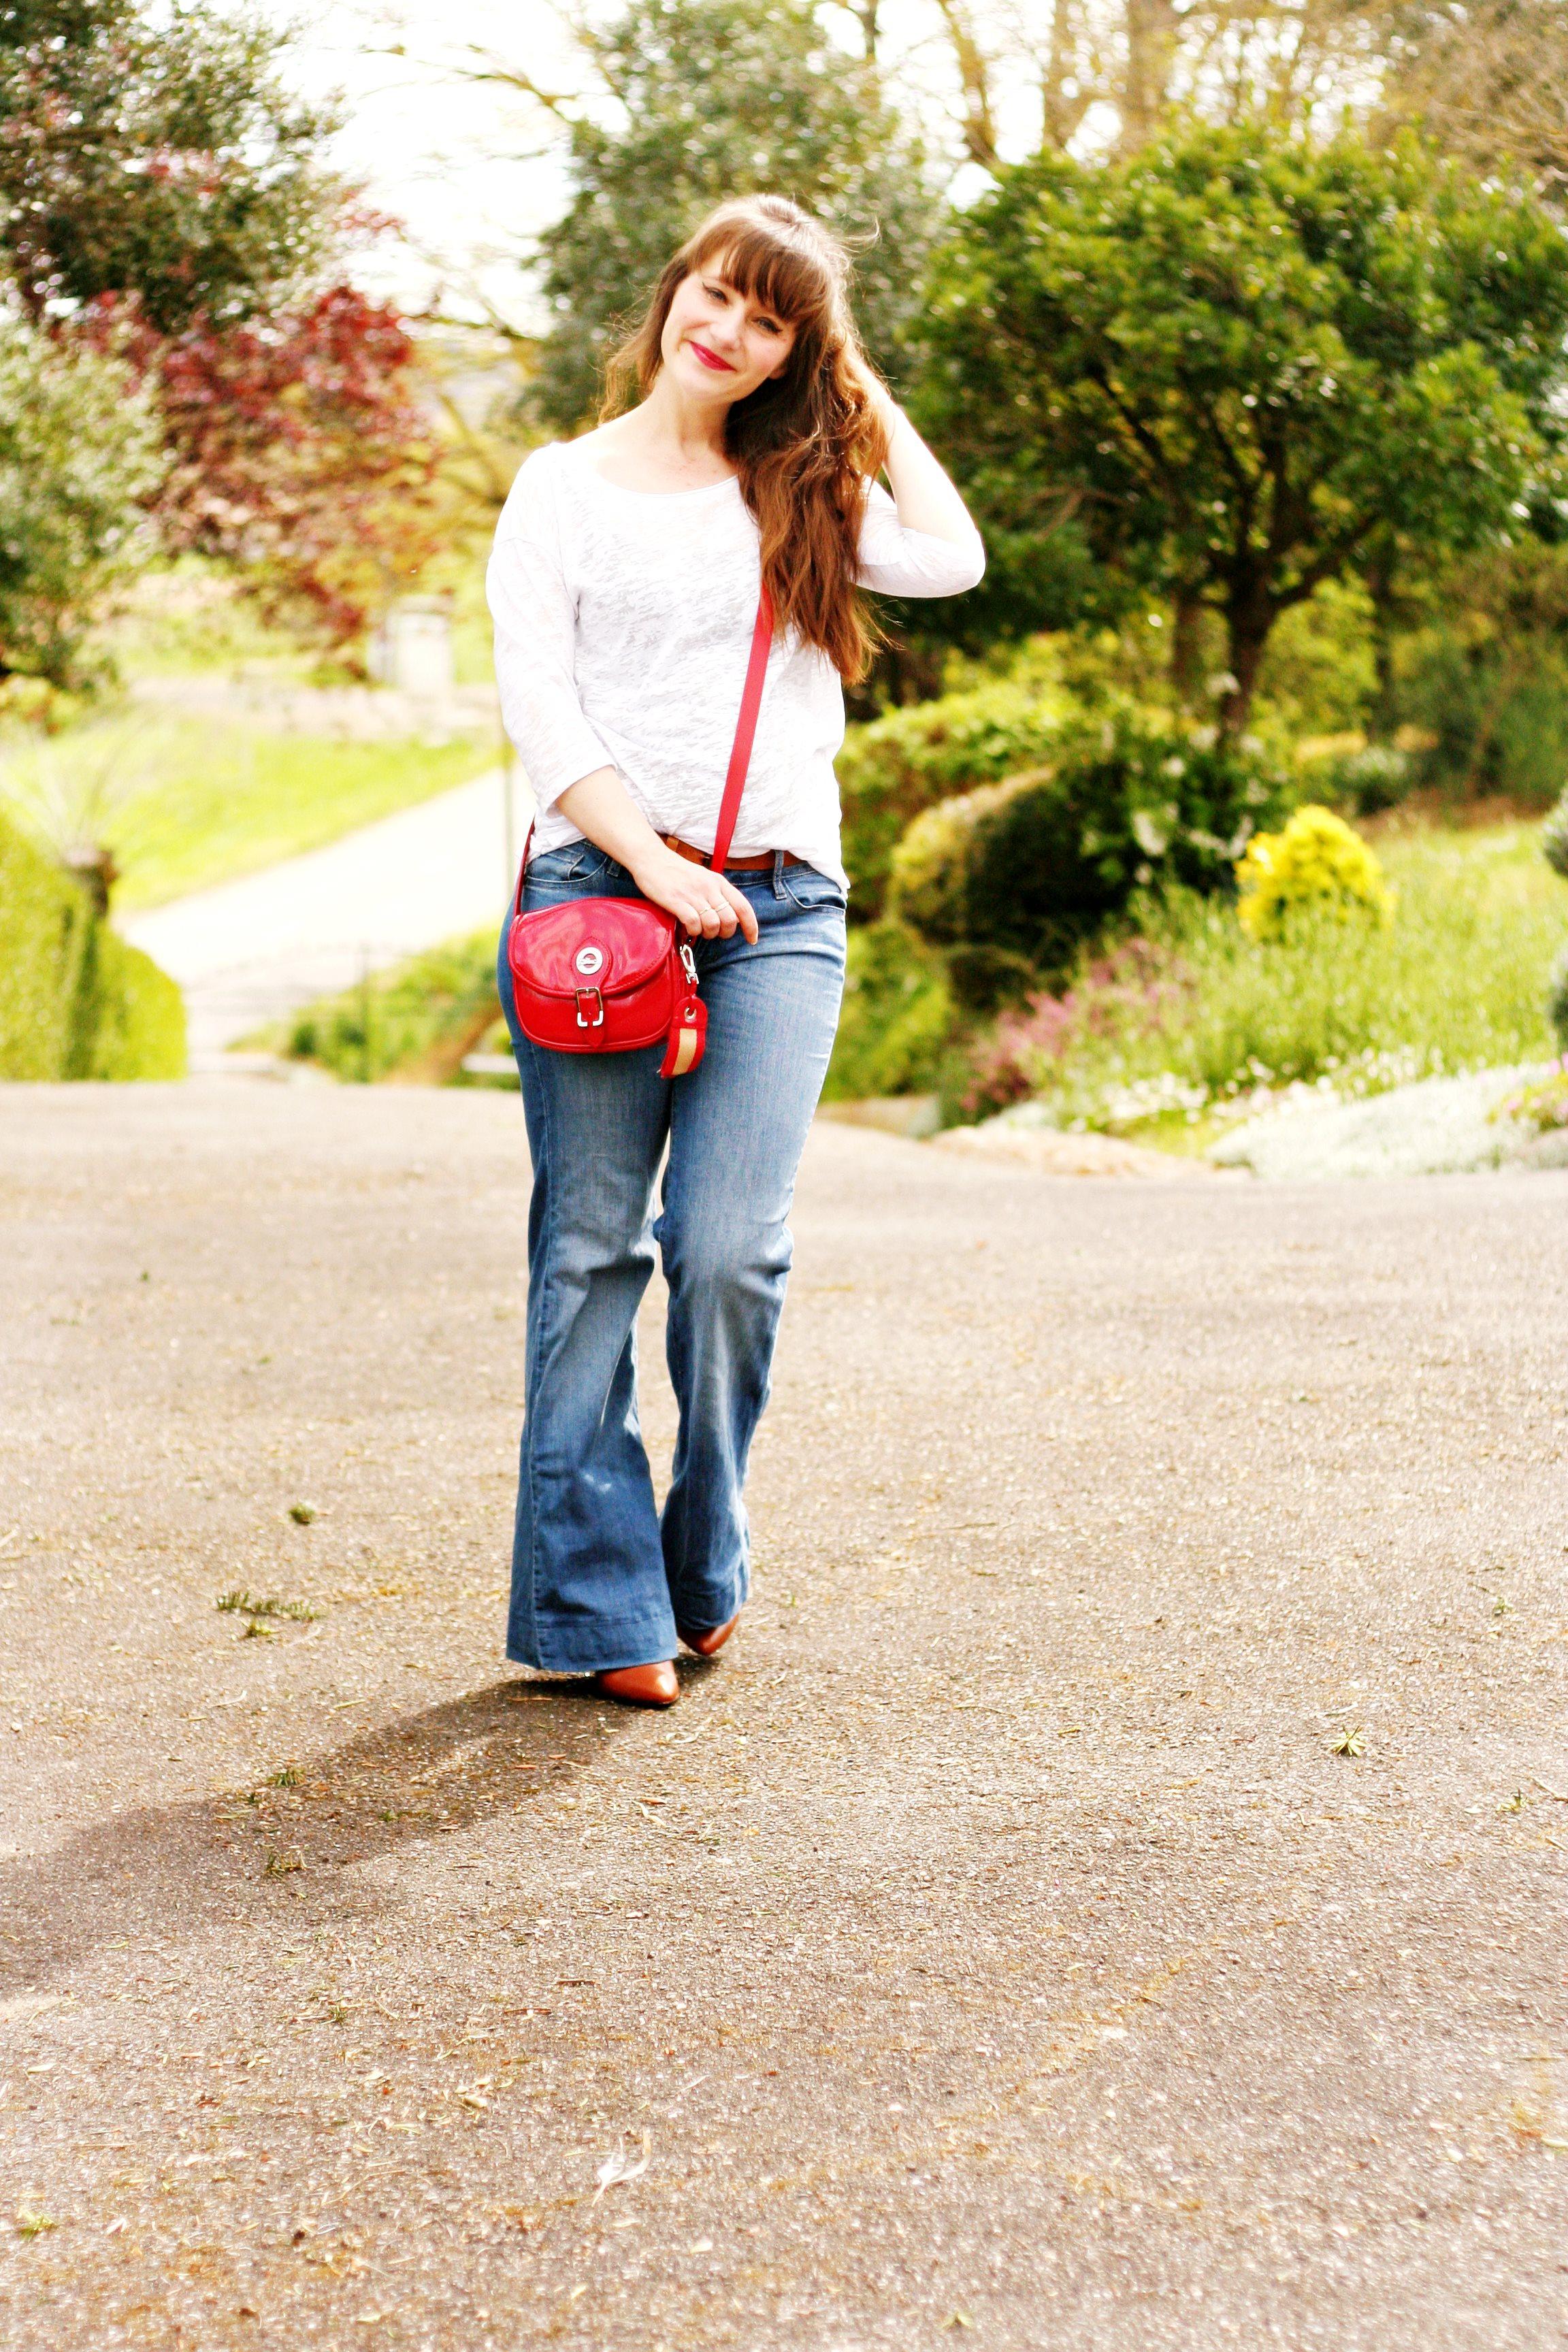 jean-flare-blog-mode-sac-longchamp-au-sultan-american-vintage-top-blogueuse-mode